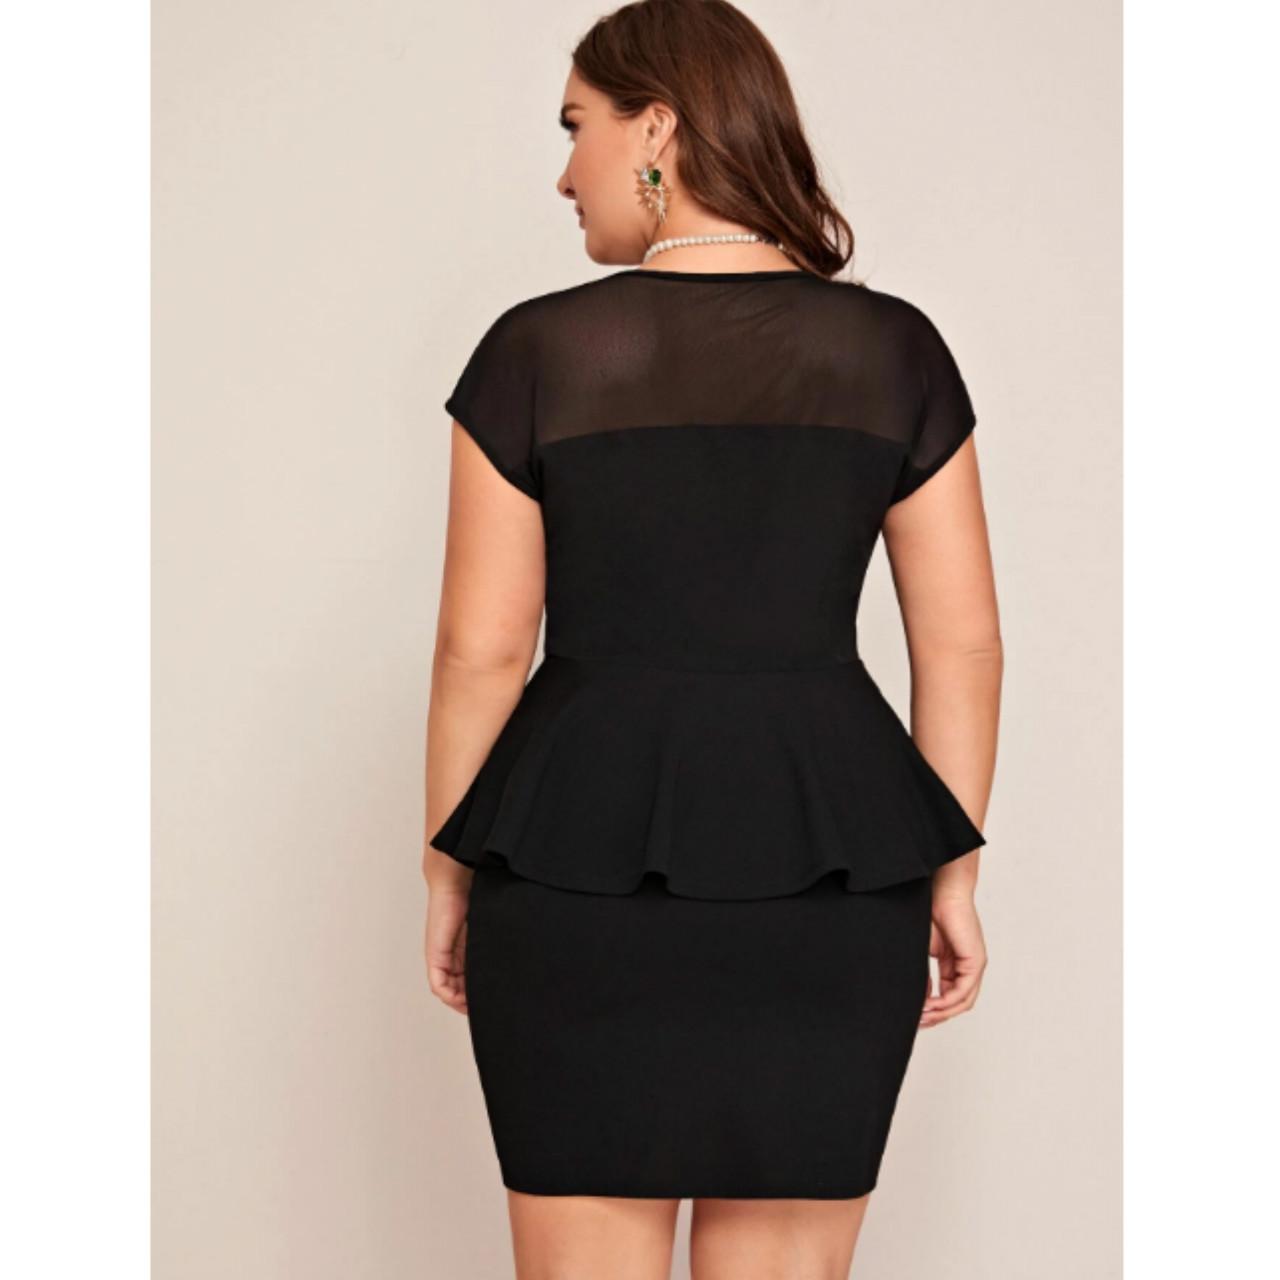 Plus mesh yoke peplum top and skirt set 1xl